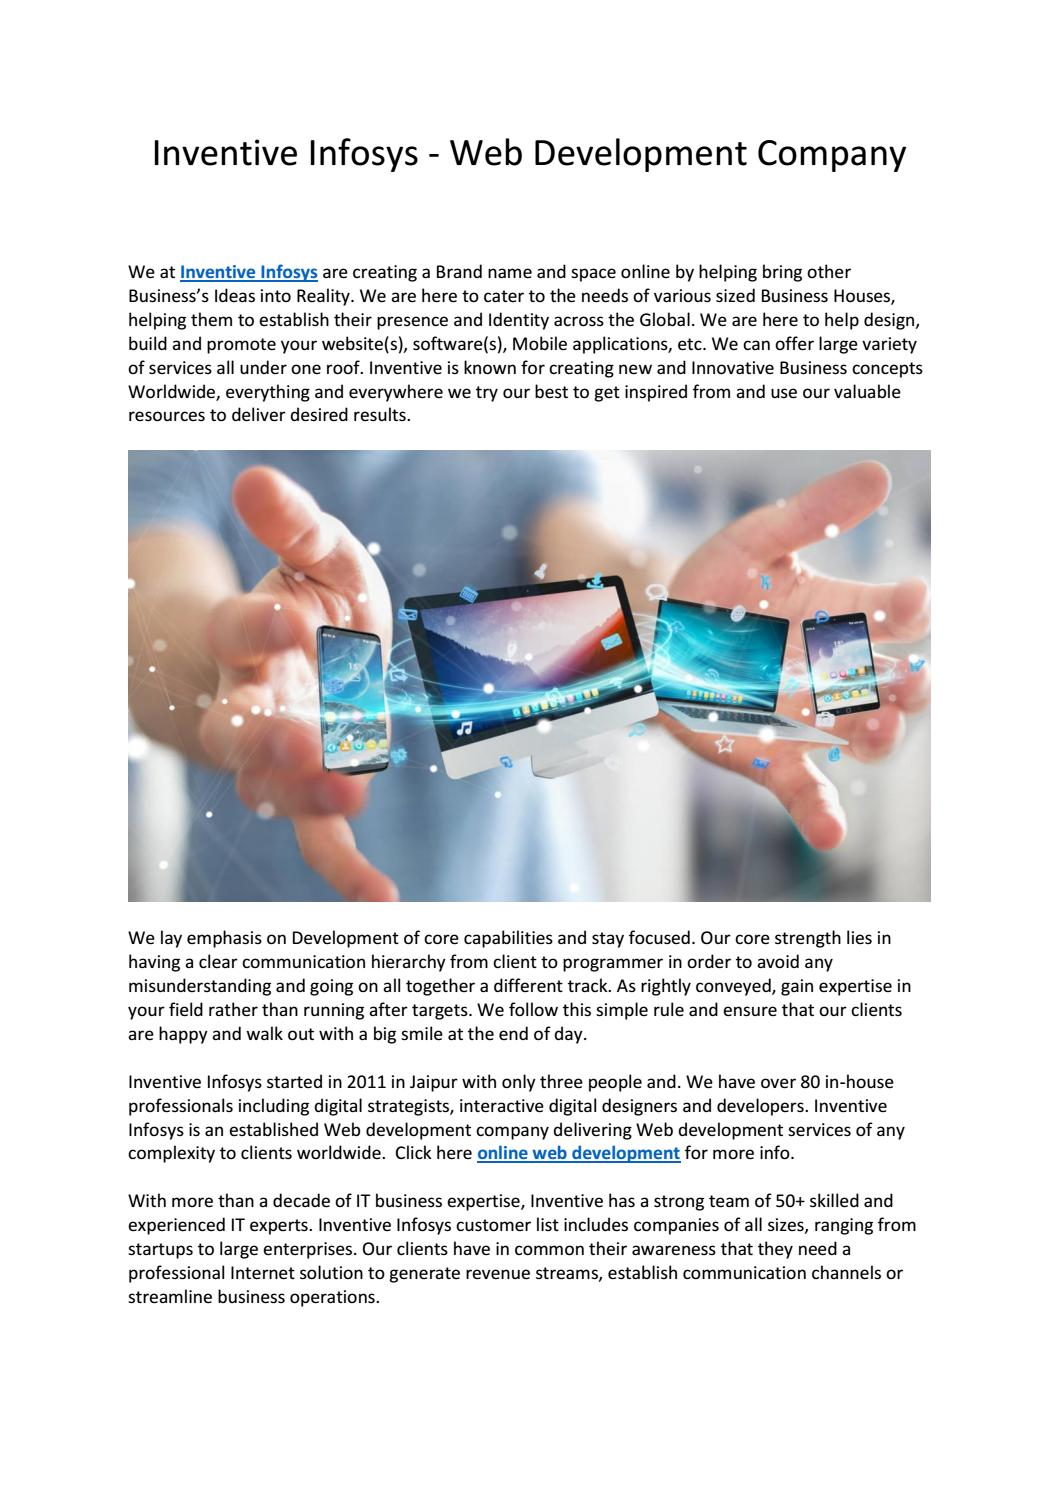 Inventive Infosys - Web Development Company by Inventive Infosys - issuu